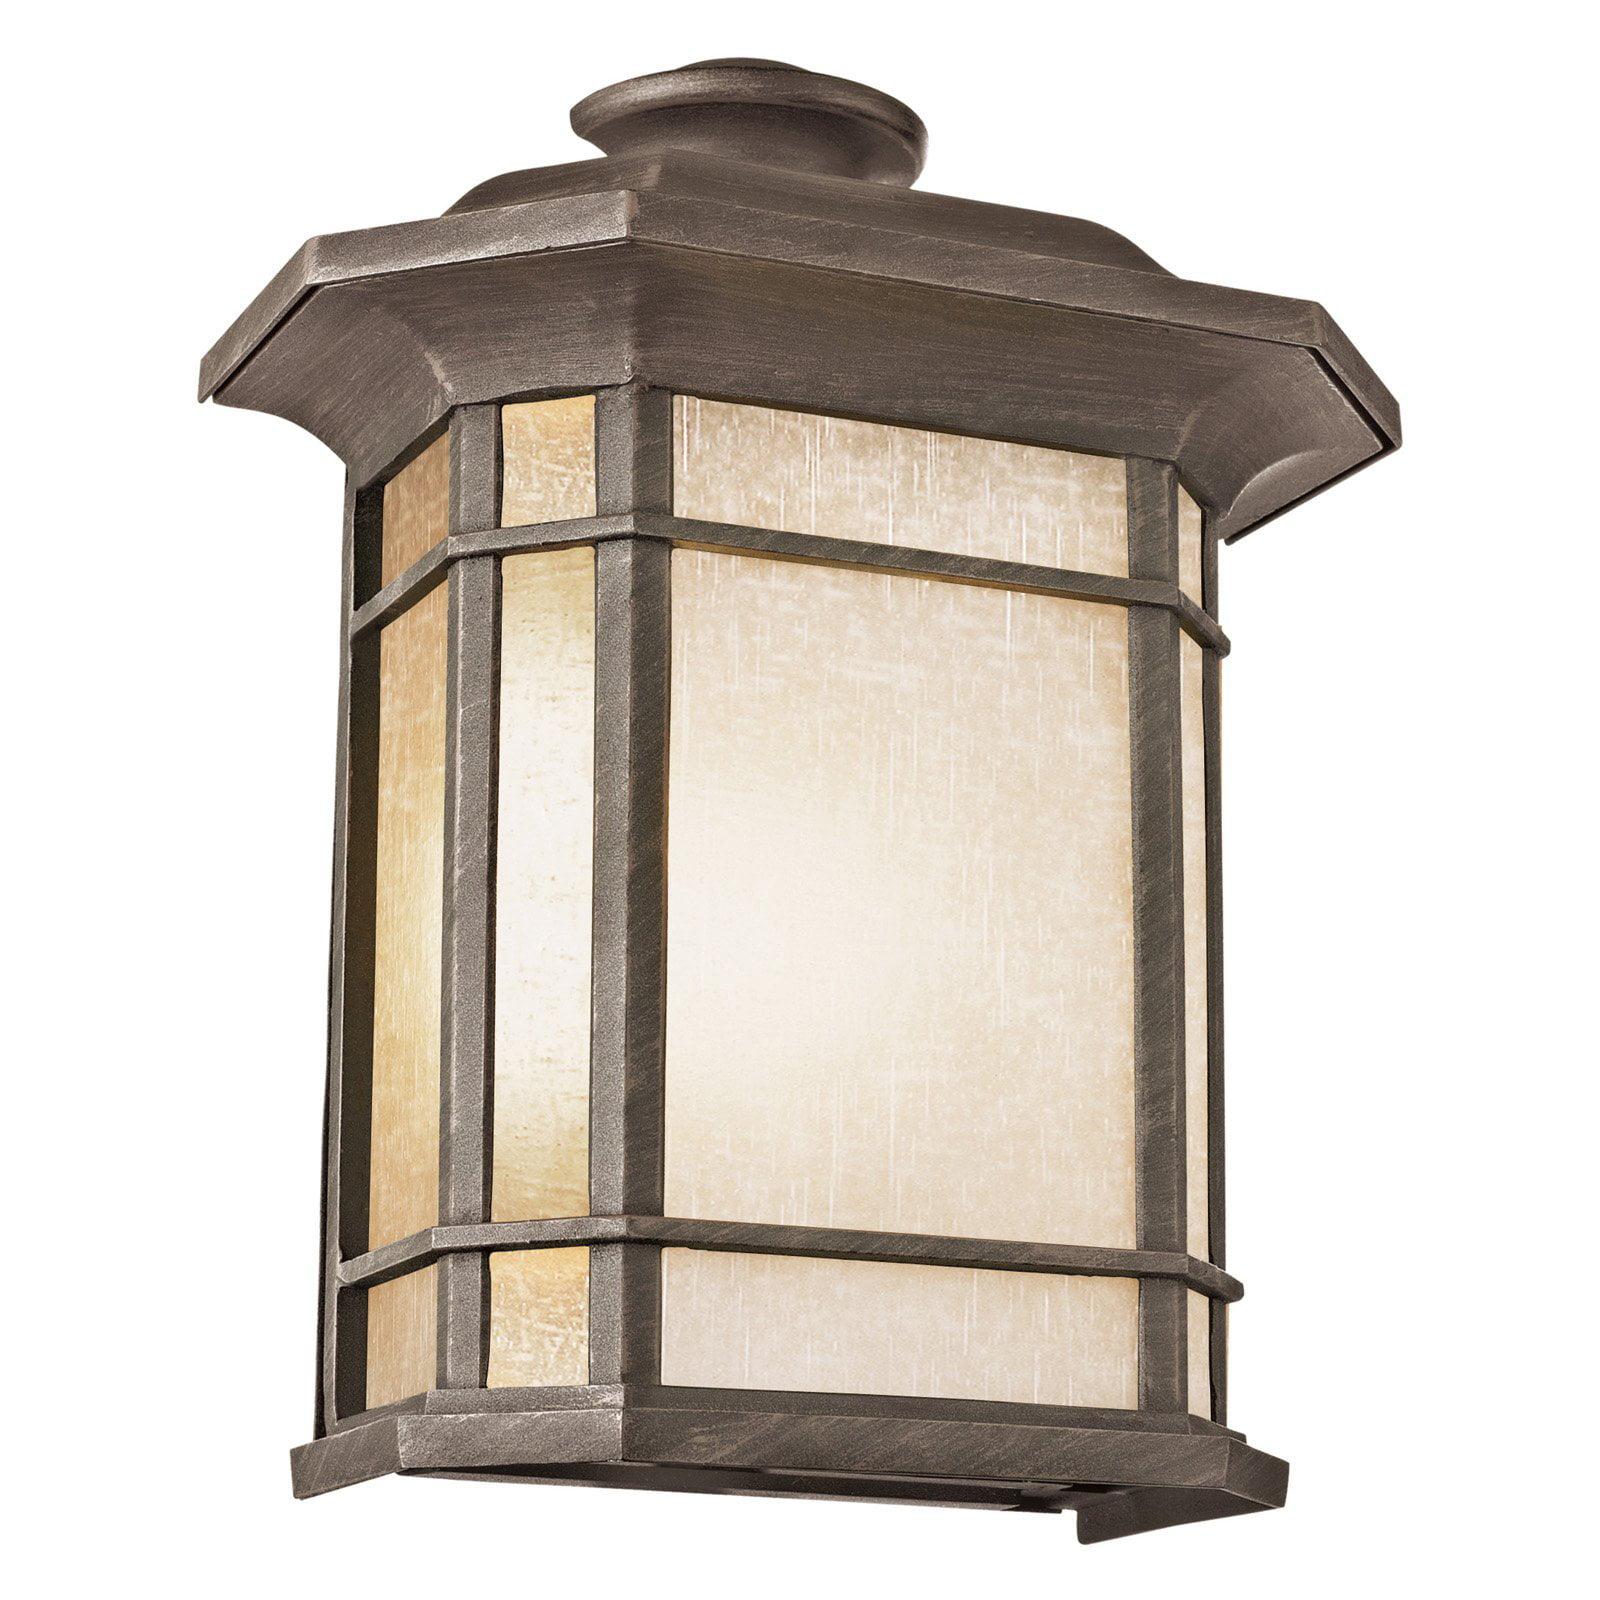 Trans Globe 5822-1 Pocket Lantern - 9.5W in.